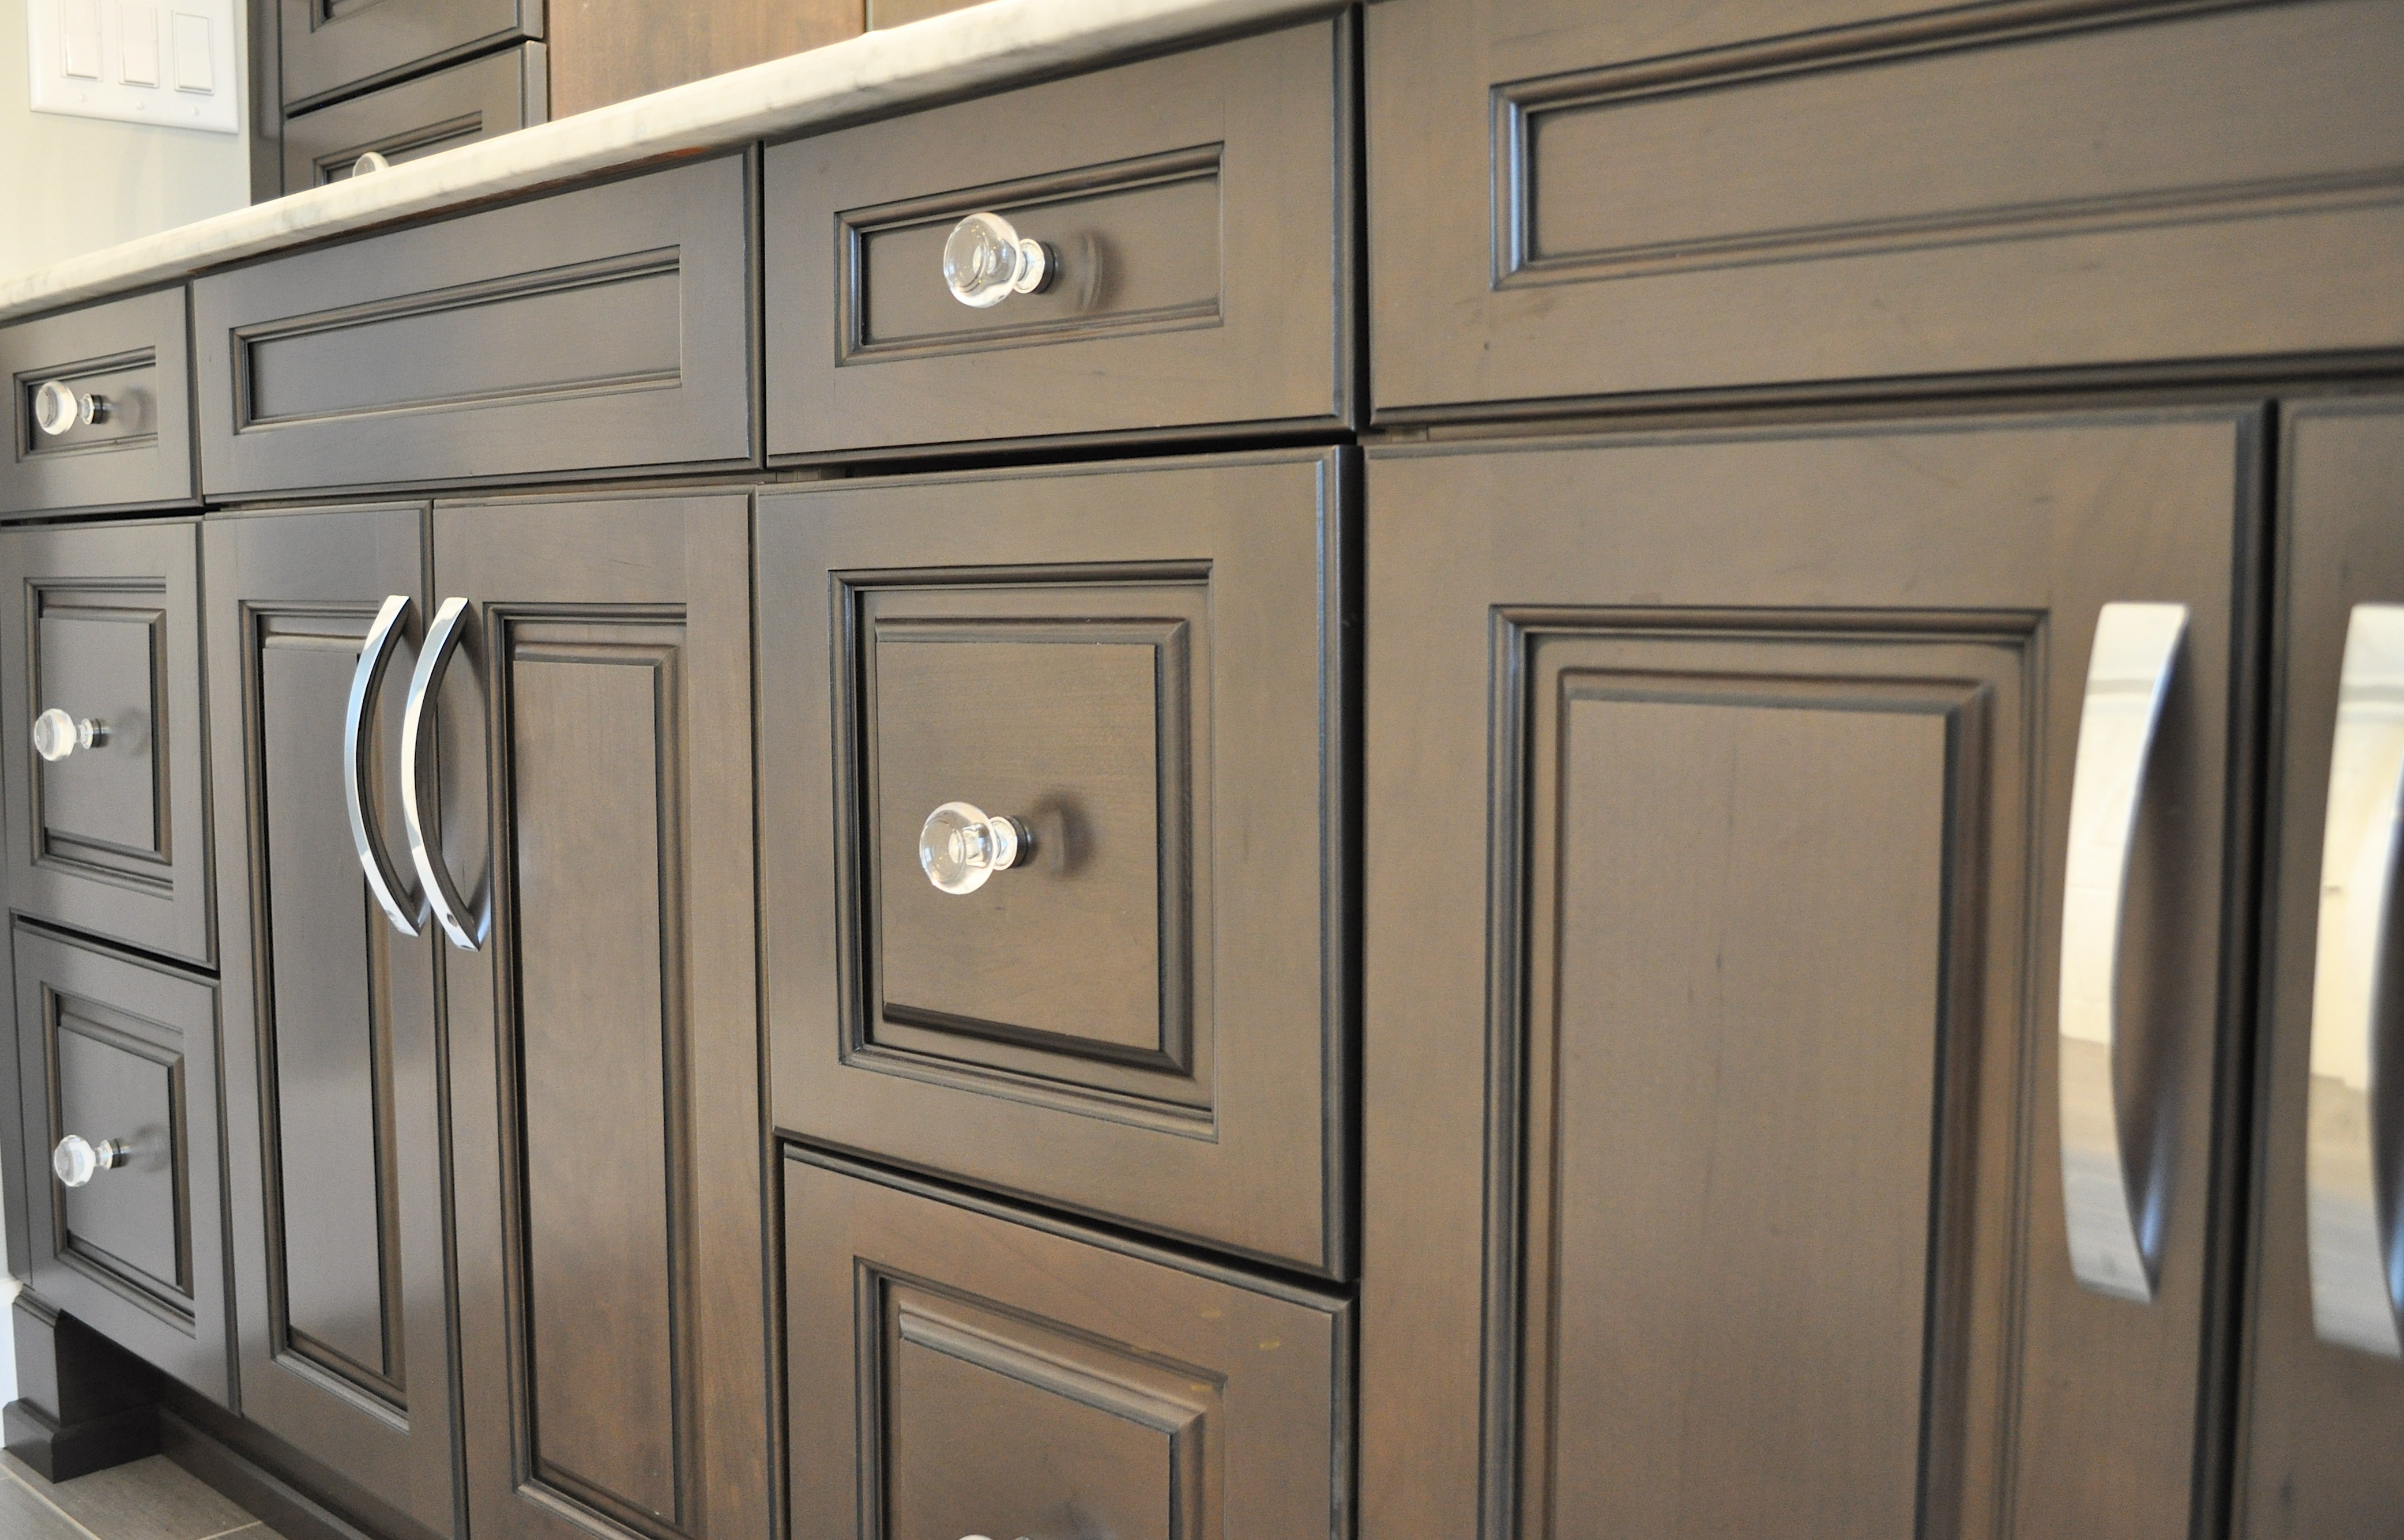 cheap kitchen door handles and knobs photo - 19